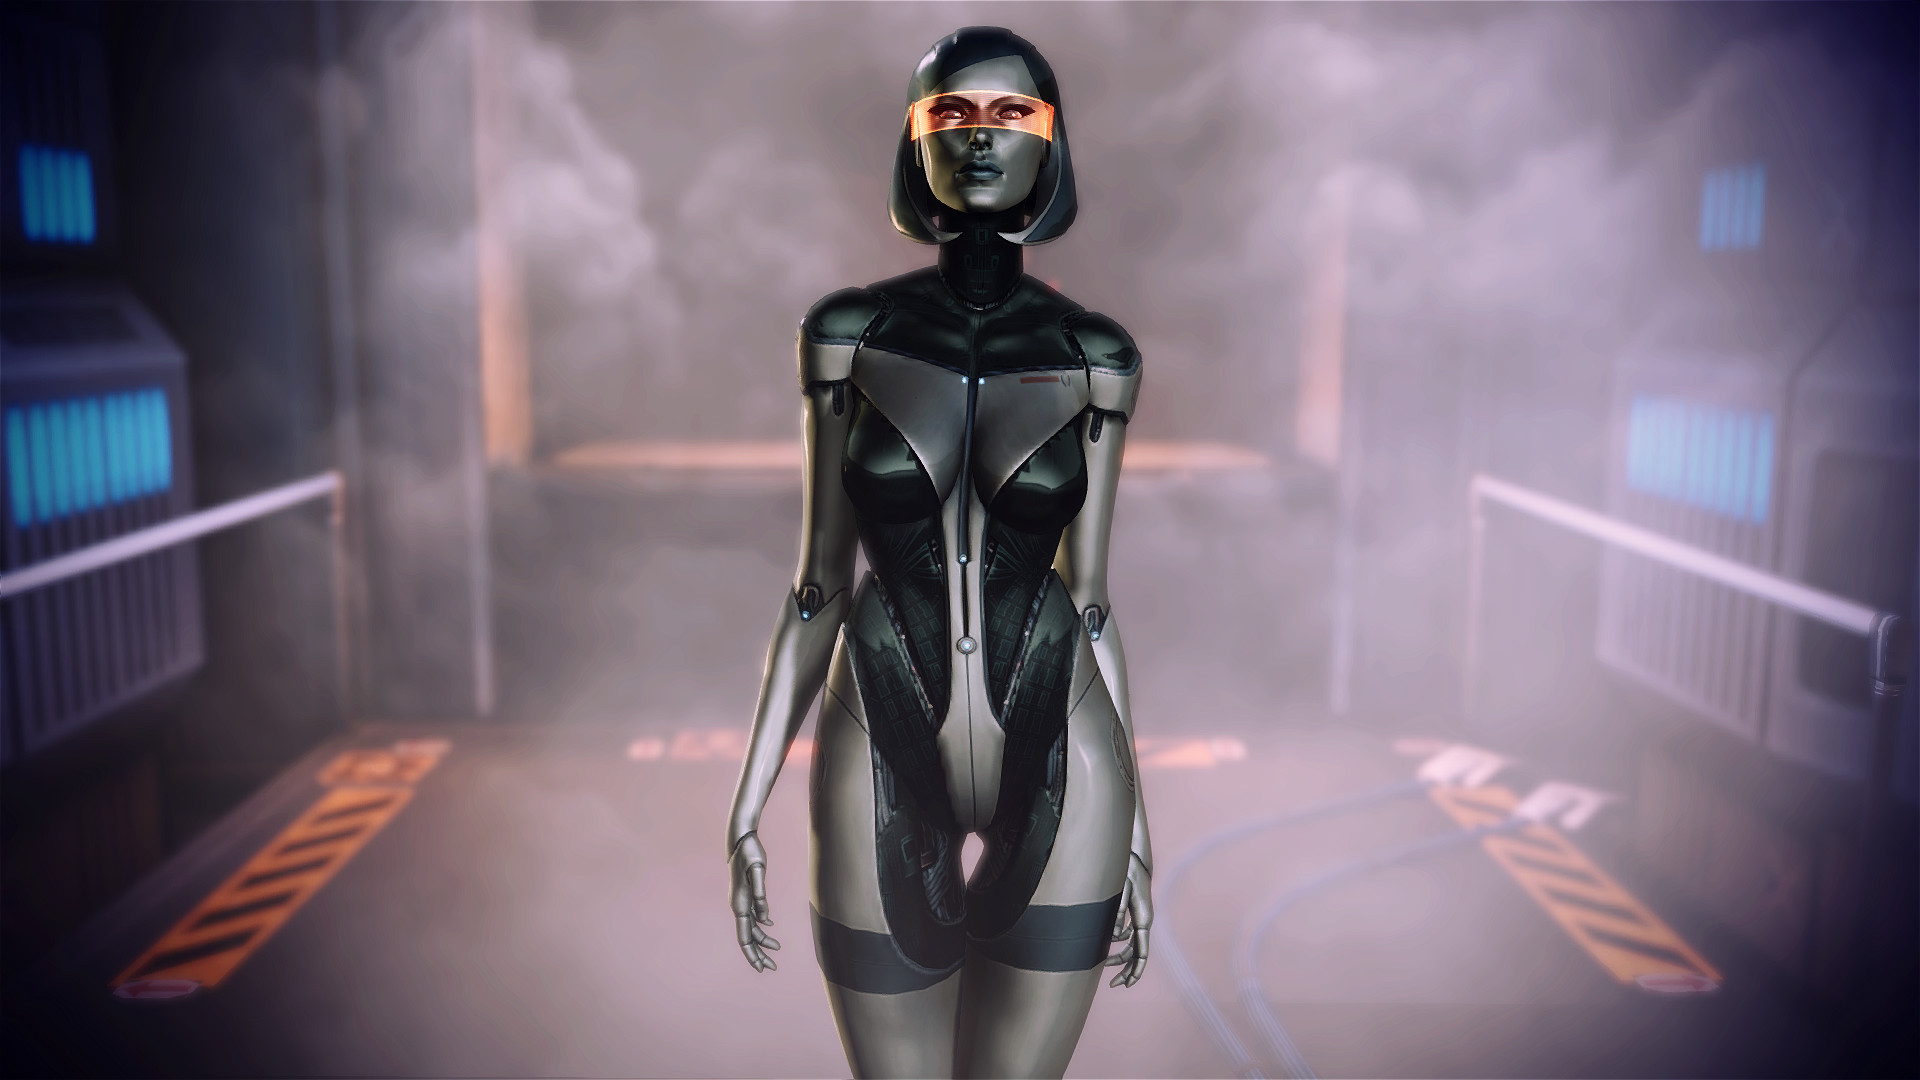 Edi Mass Effect Wallpaper Wallpapersafari